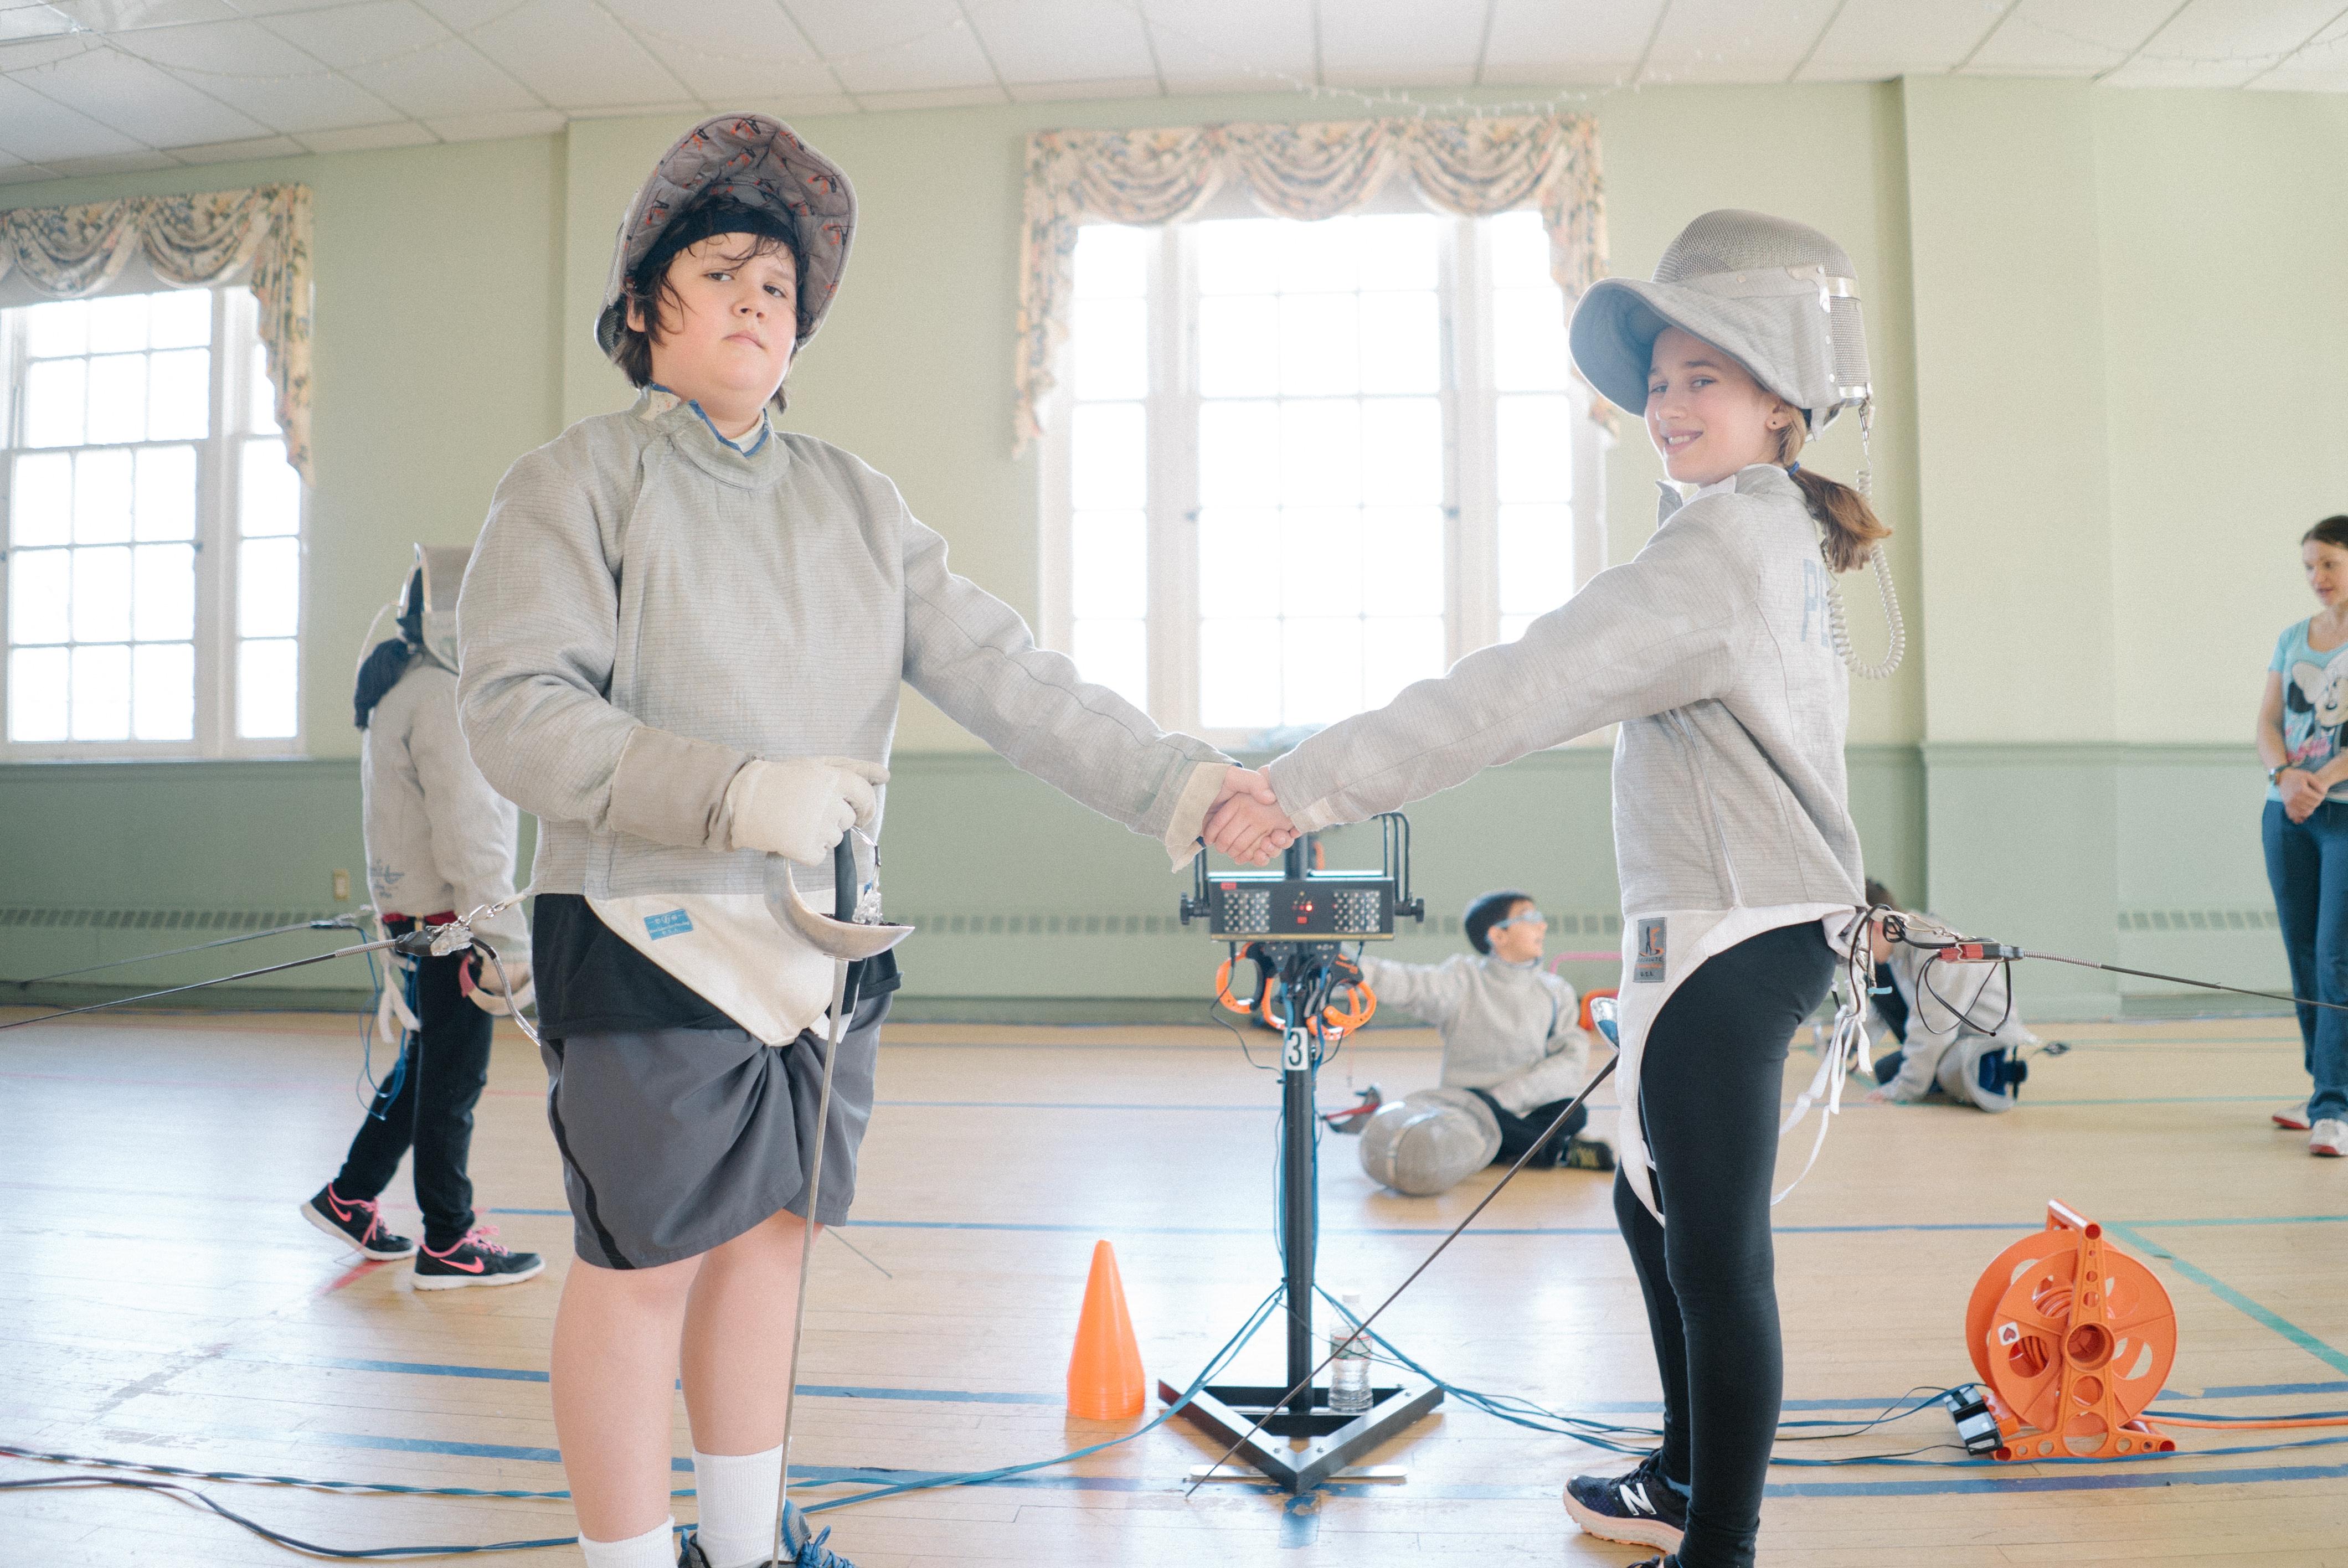 fencing-14.jpg